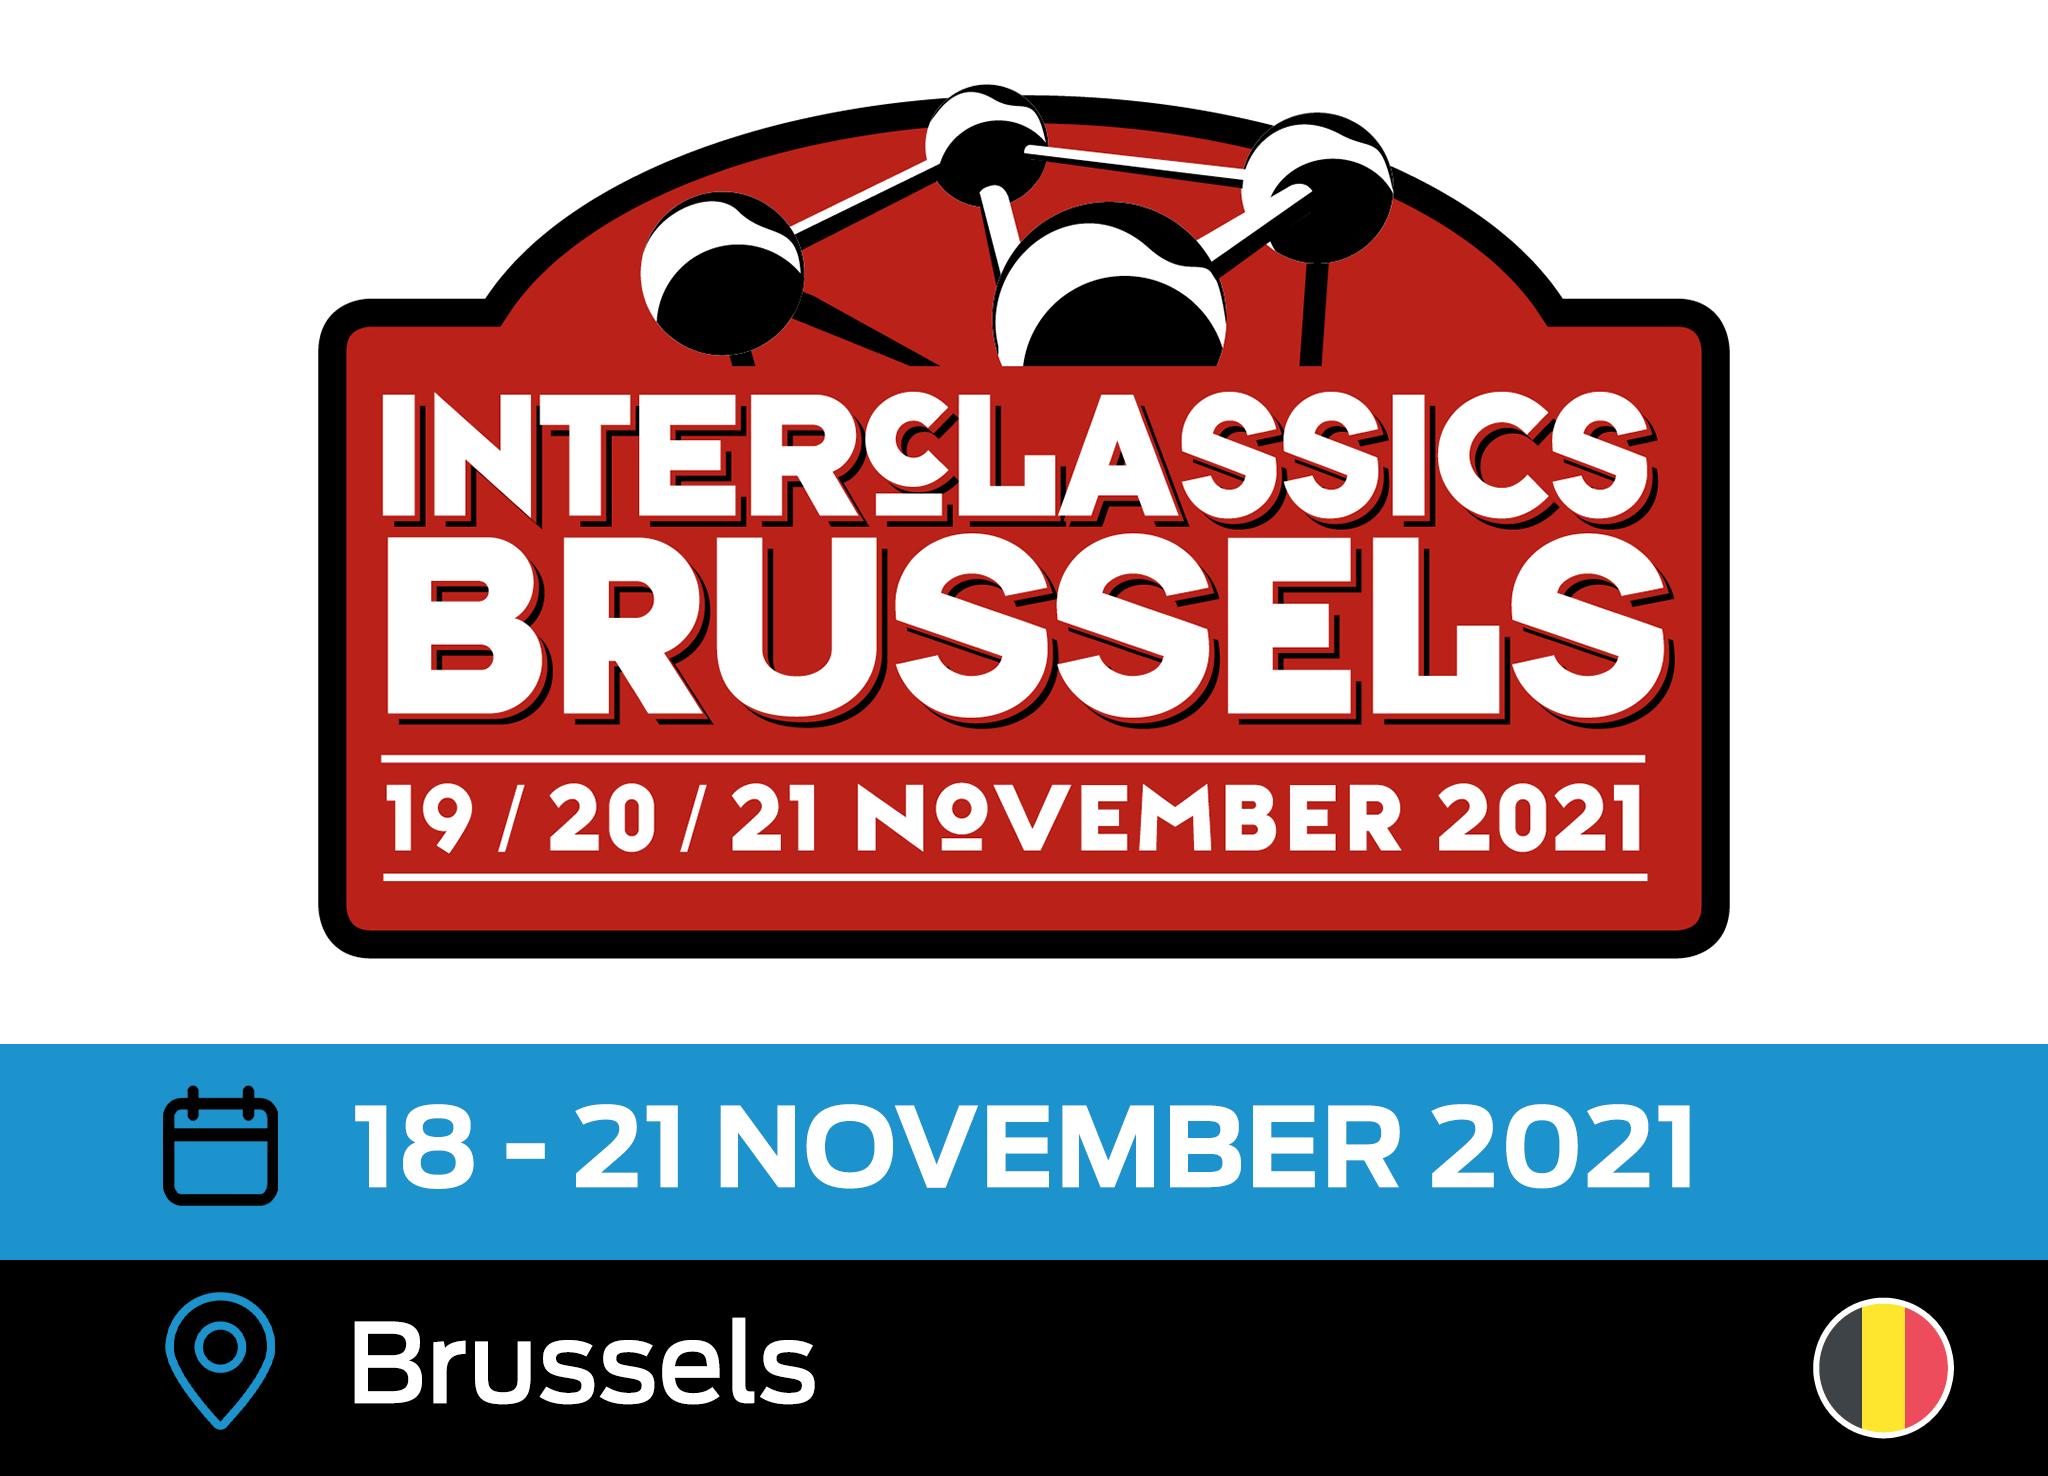 InterClassics Brussels 2021